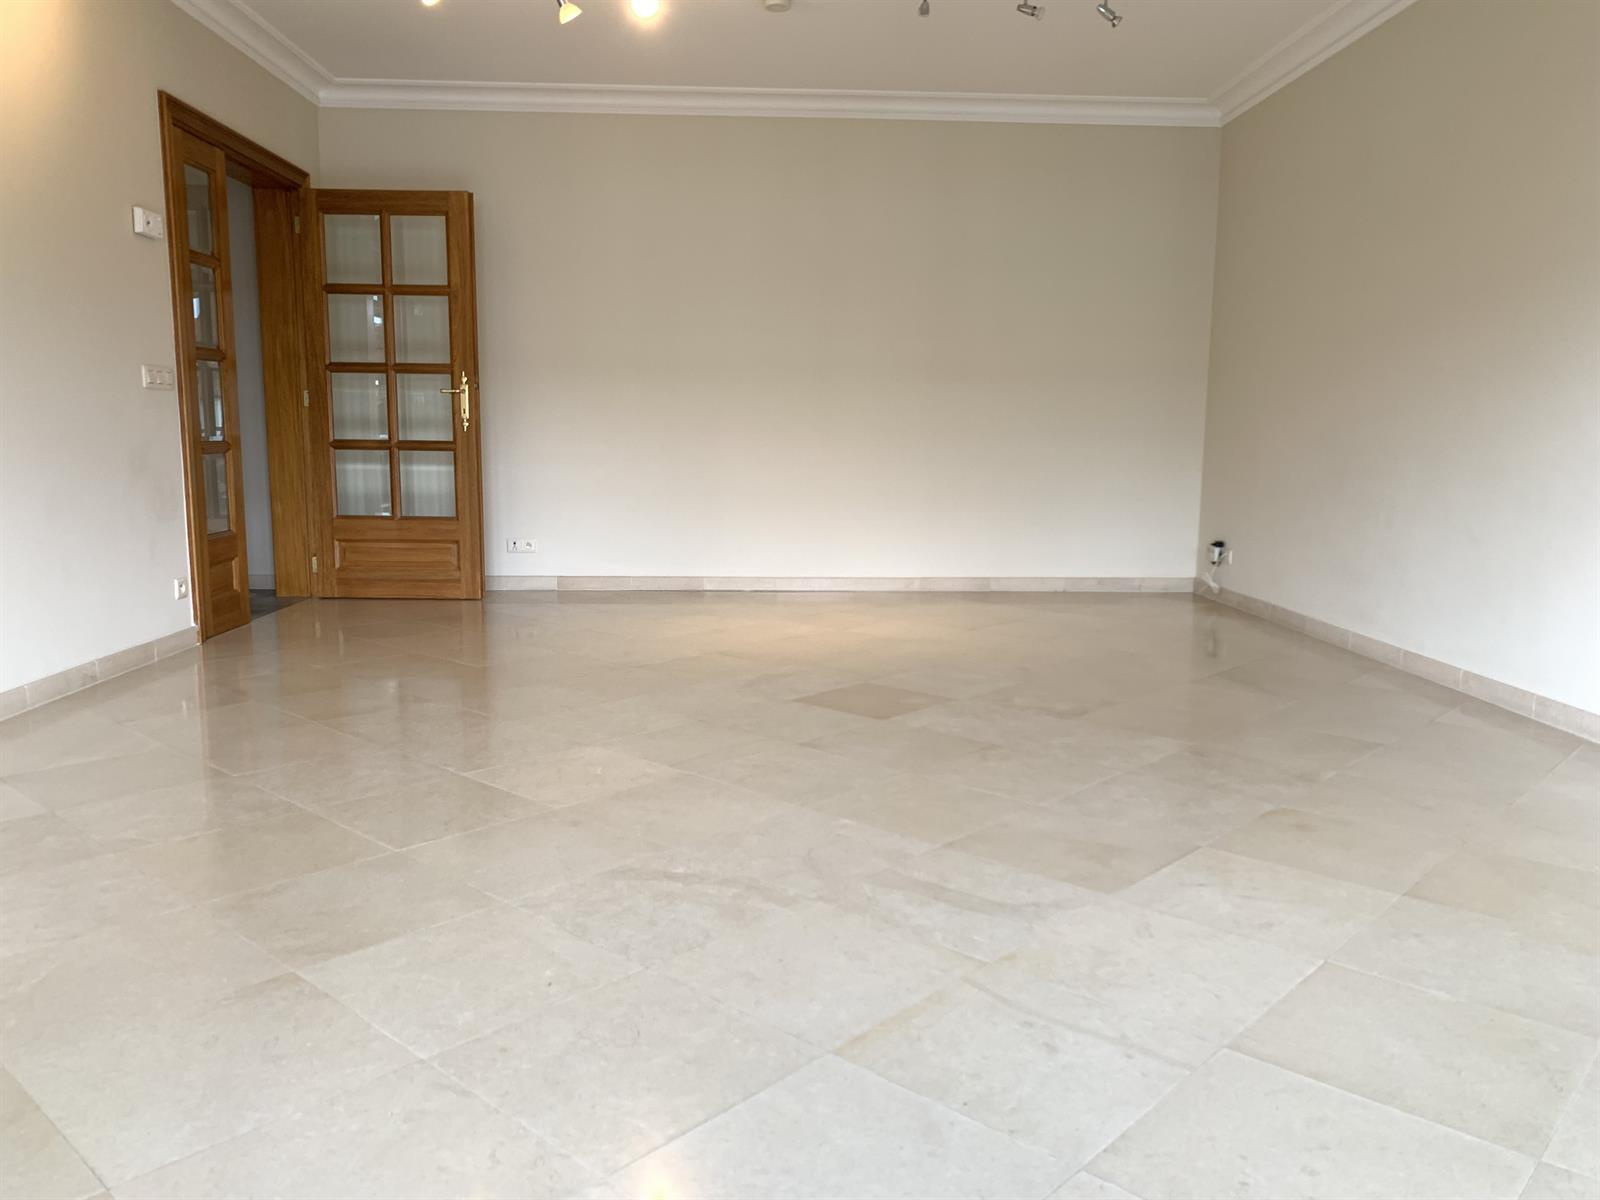 Appartement exceptionnel - Woluwe-Saint-Pierre - #4433517-23